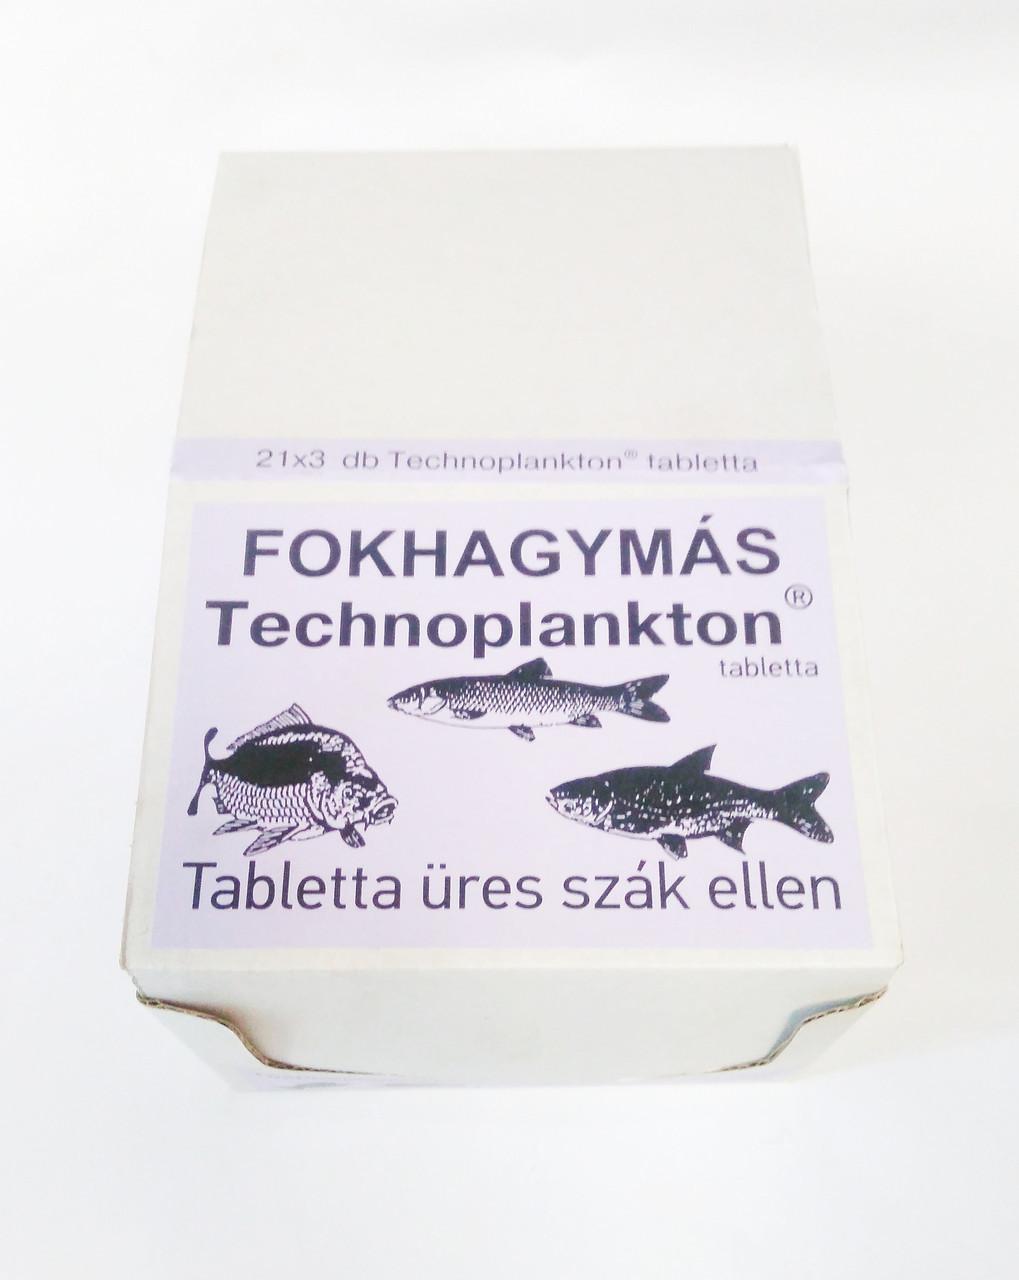 Технопланктон Fokhagymas(чеснок) блок.